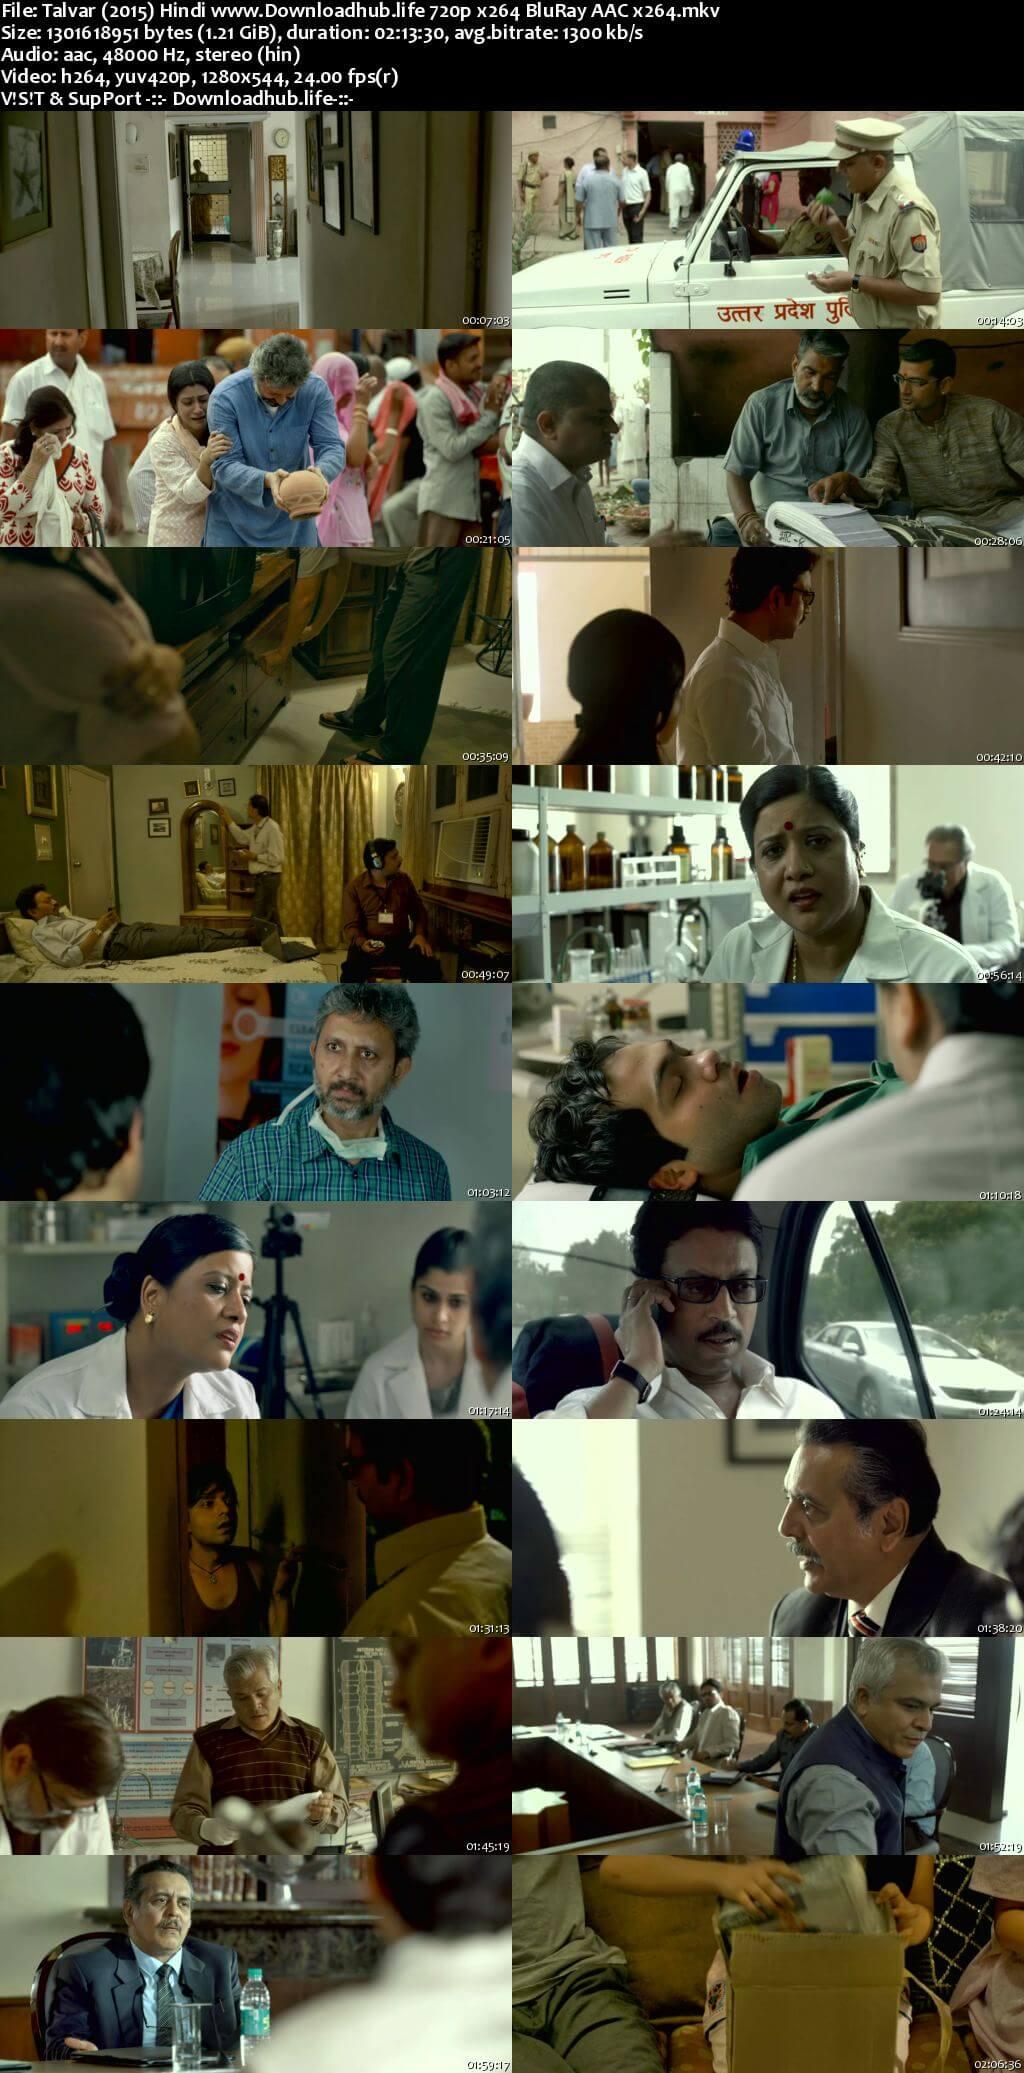 Talvar 2015 Hindi 720p BluRay x264